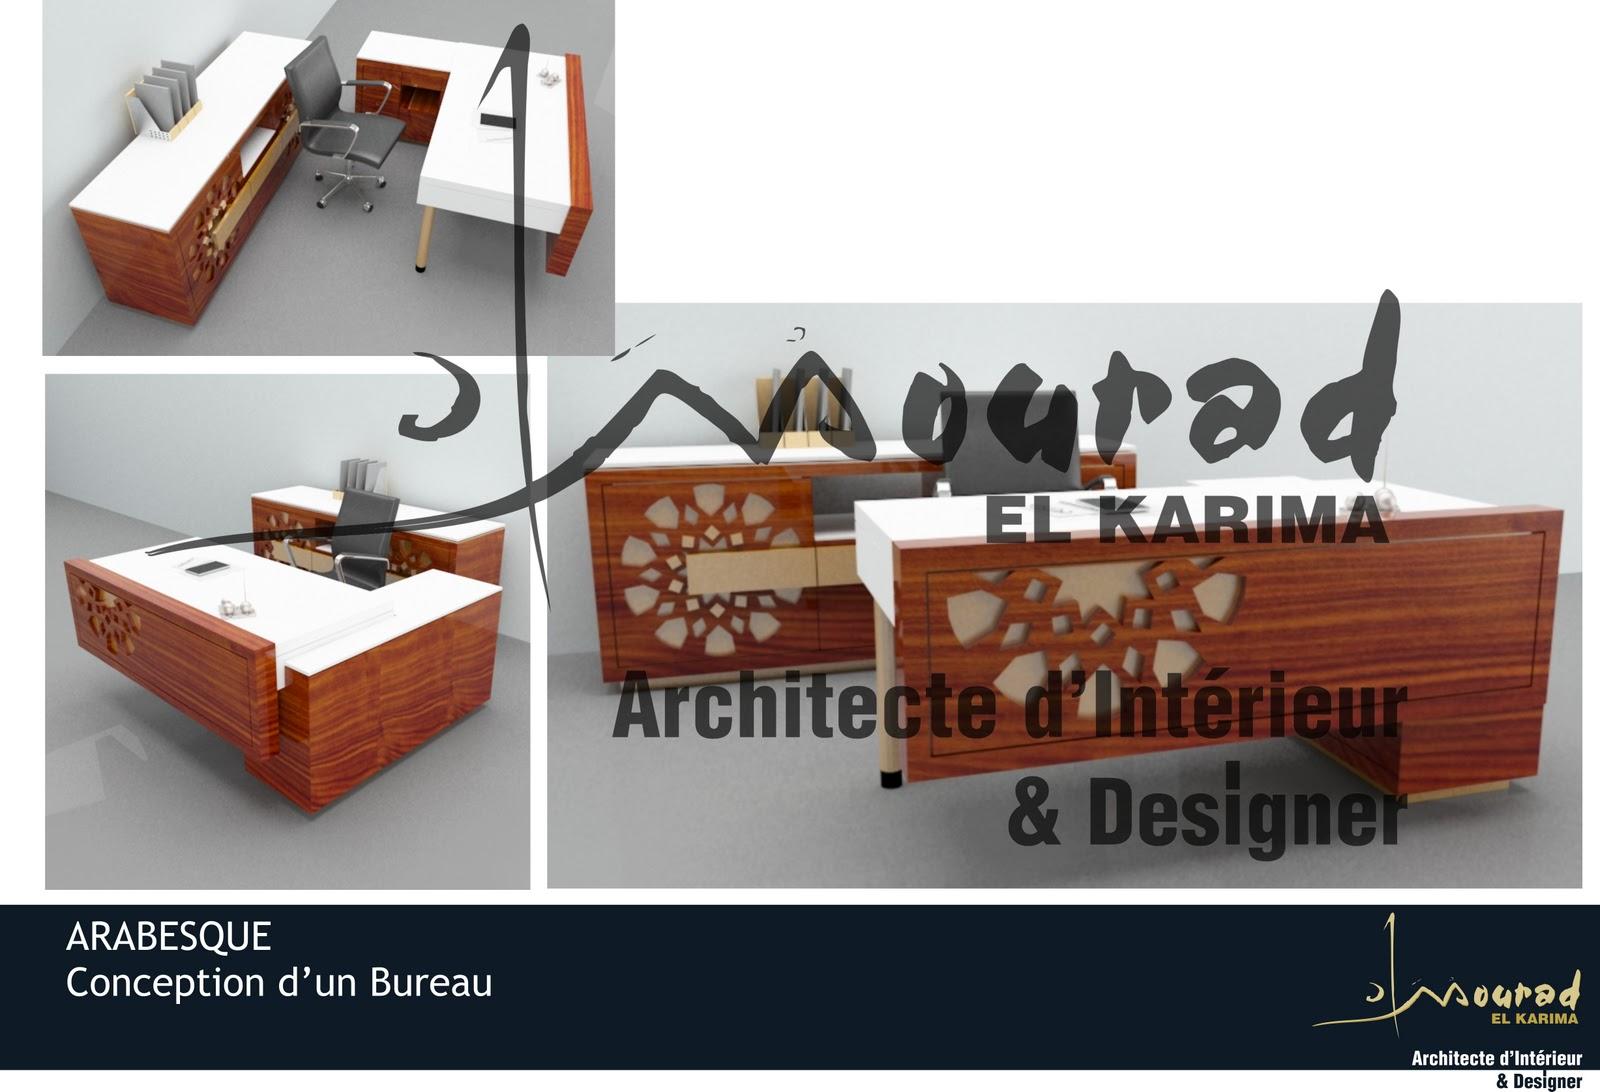 Bureau arabesque mourad el karima architecte d interieur